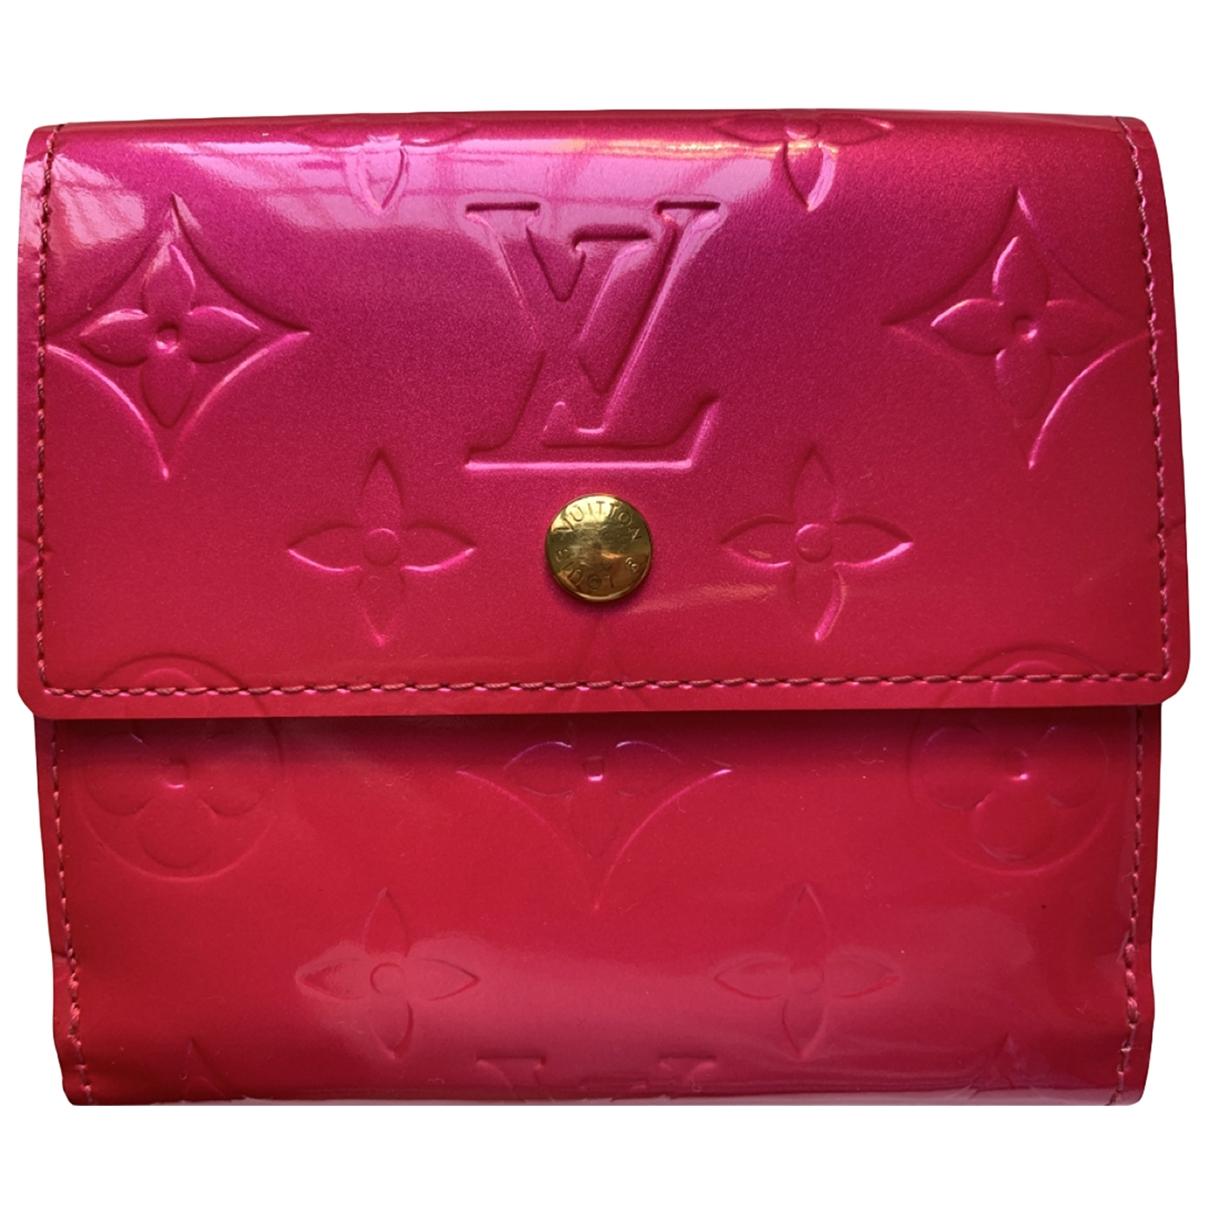 Louis Vuitton \N Portemonnaie in  Rosa Lackleder